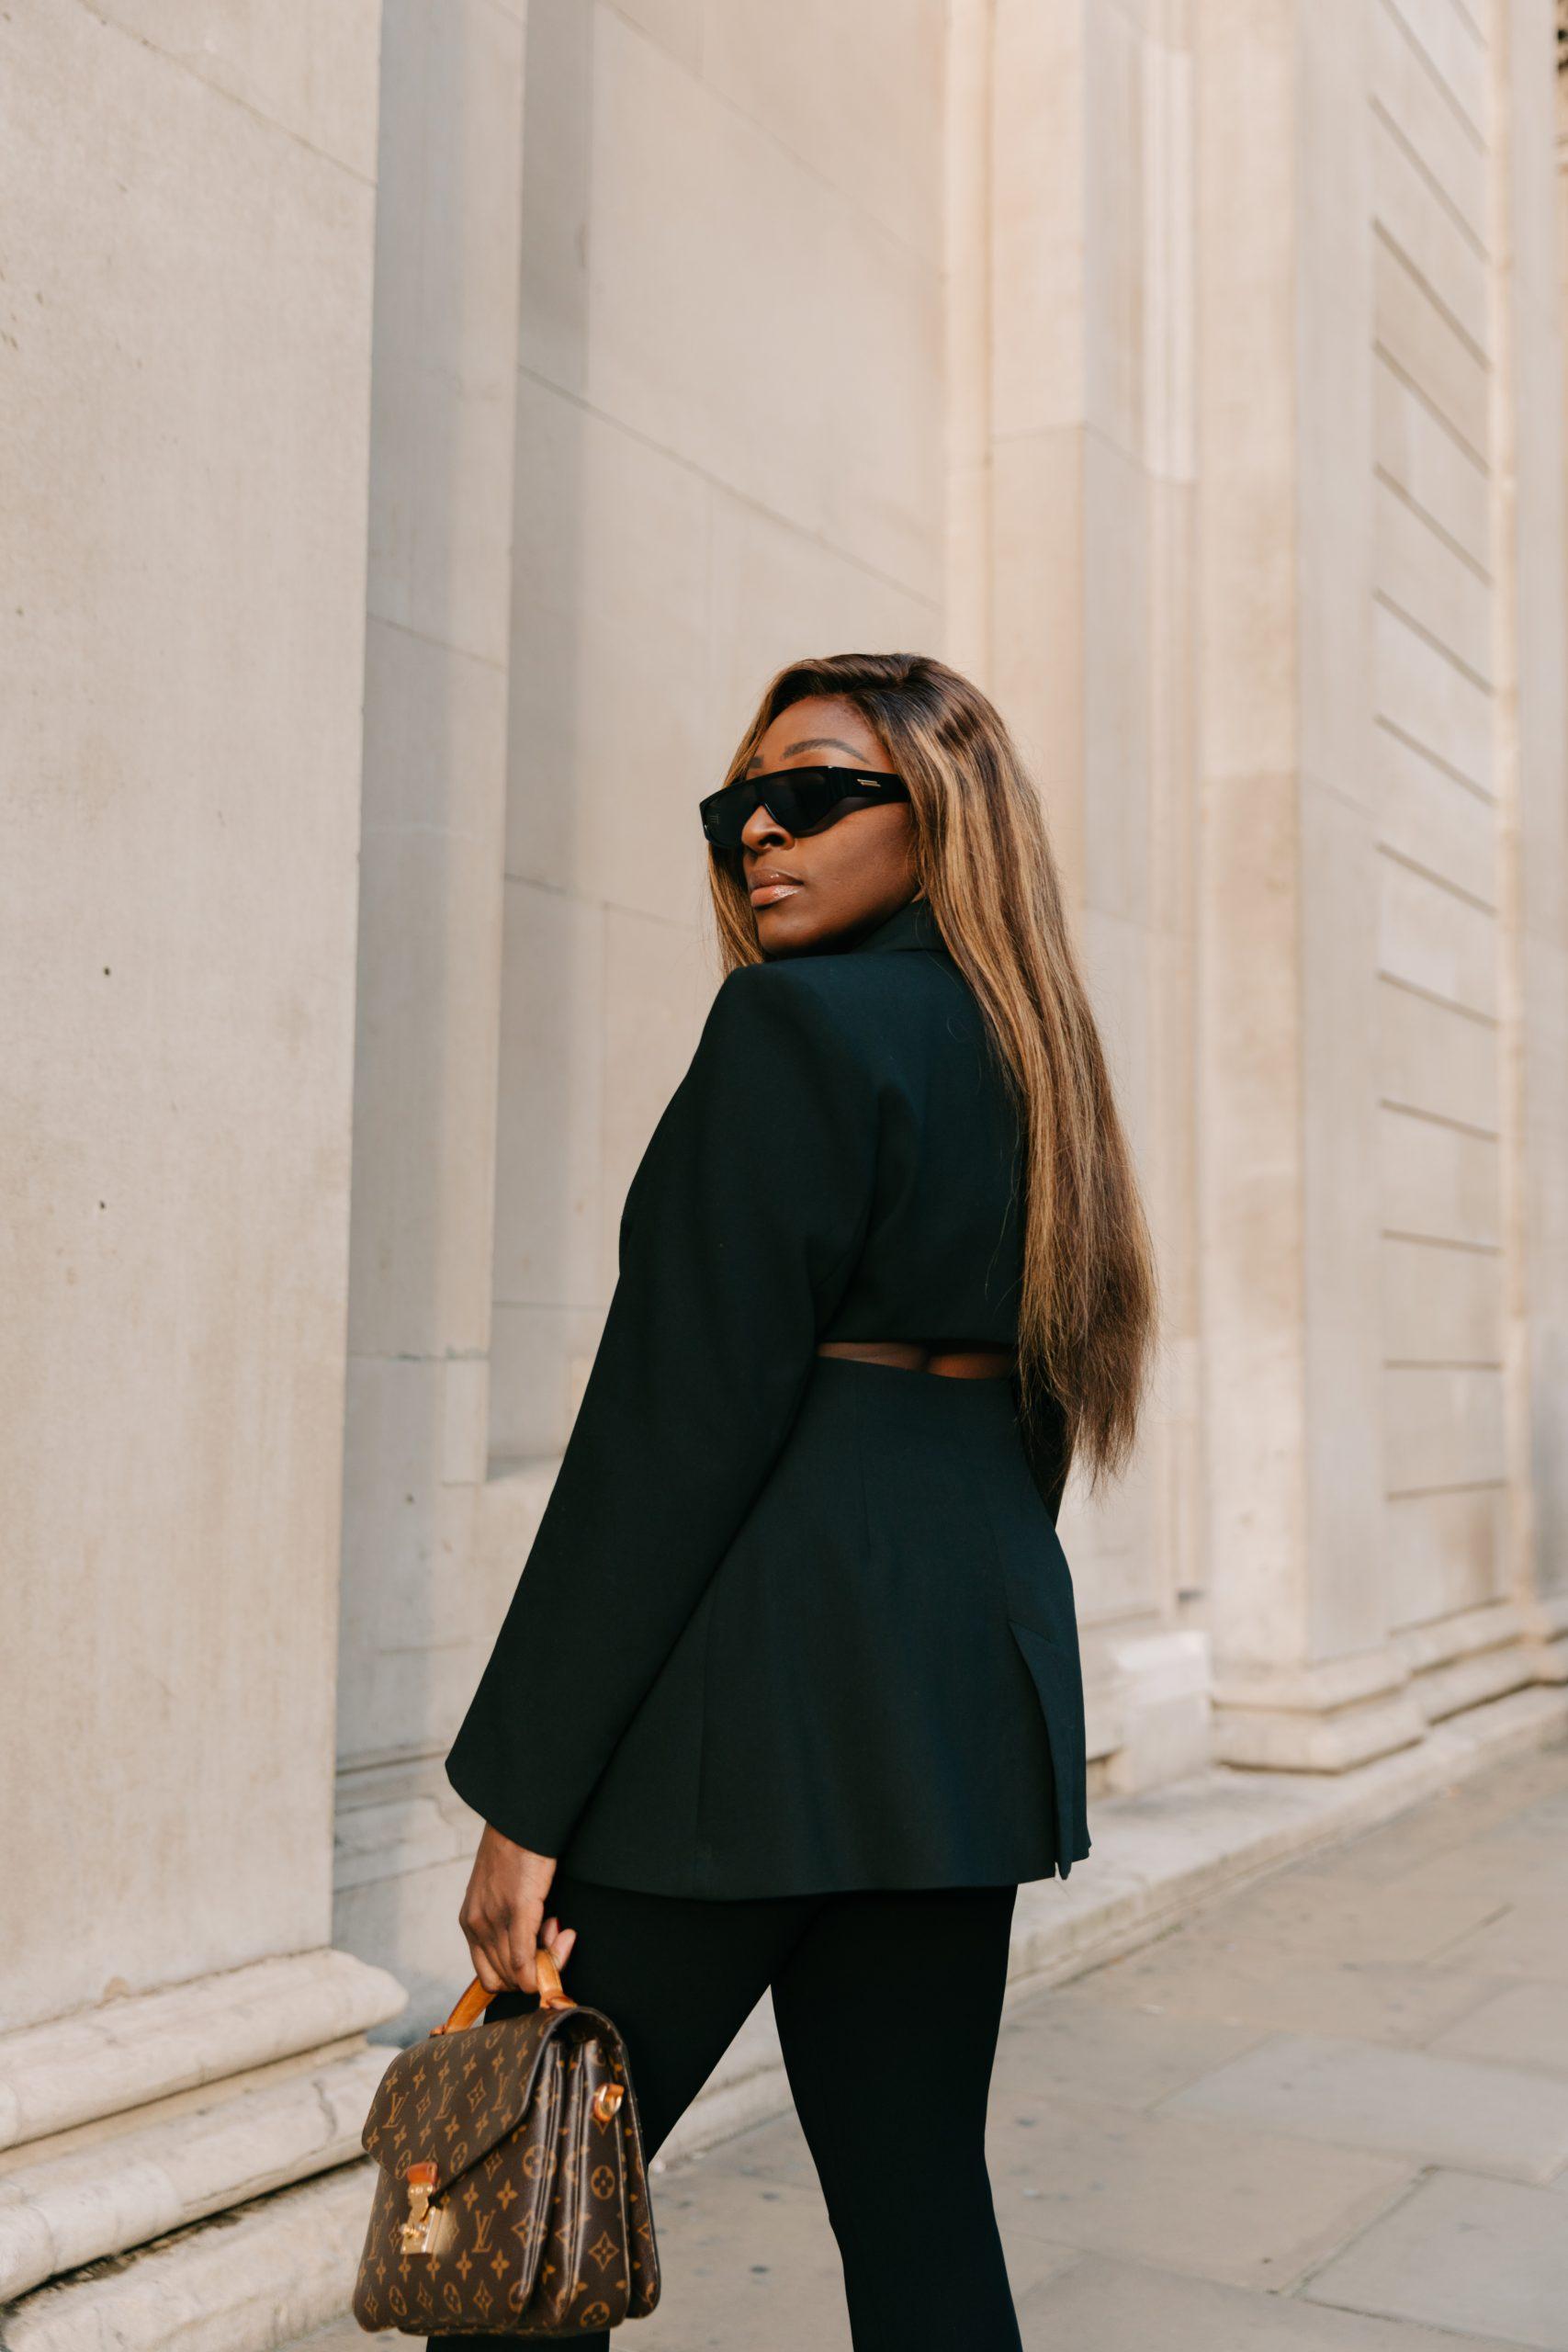 What is SEO? The Basics - Zara fitted blazer 5 - Tasha Antwi